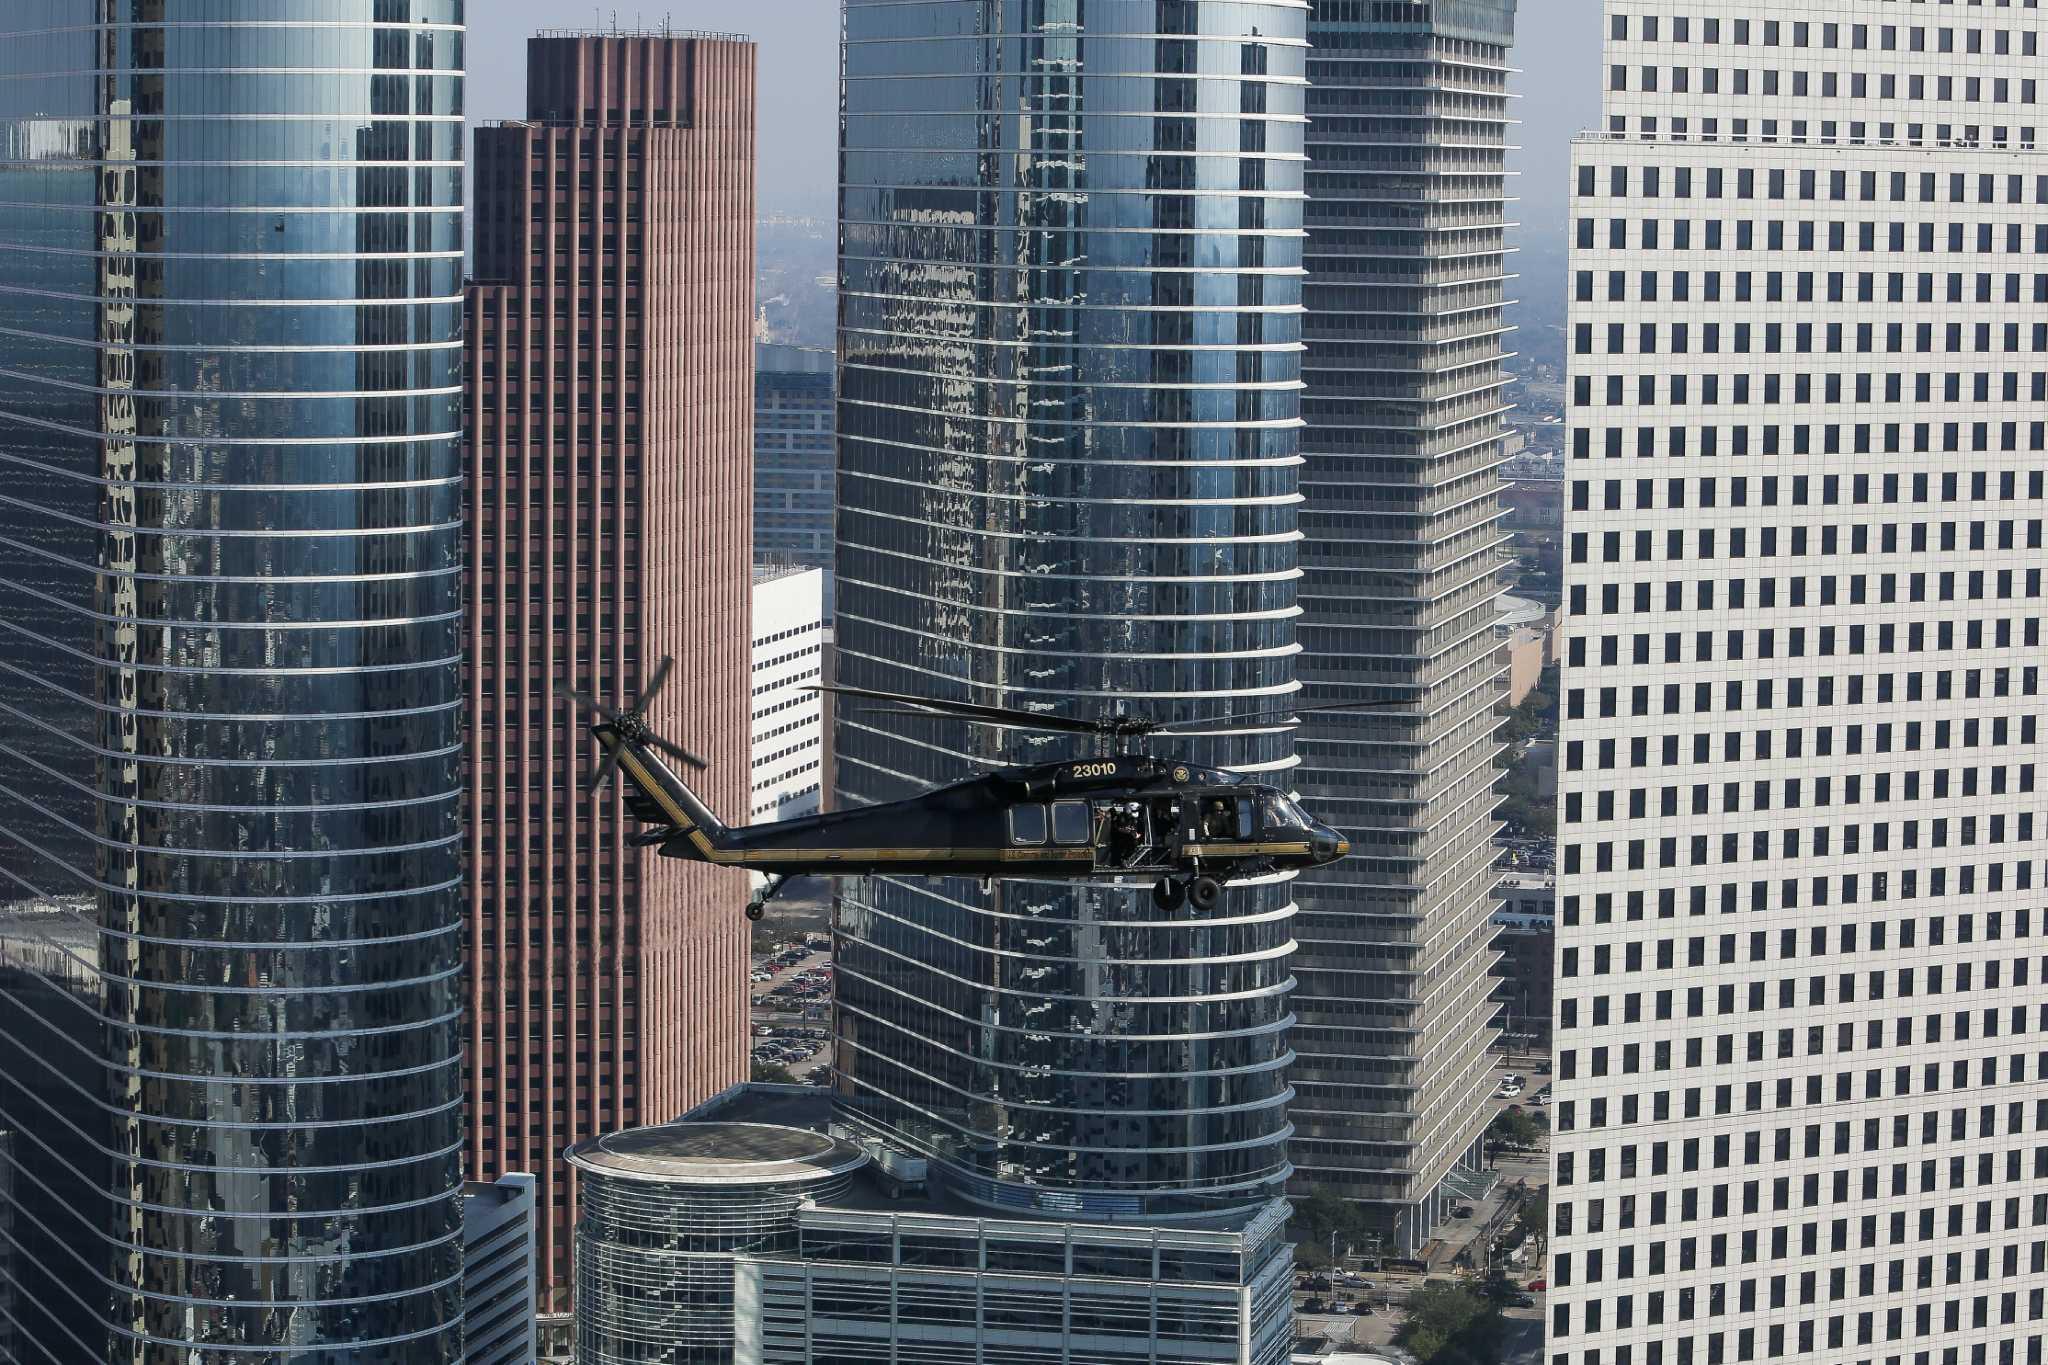 601 jefferson street houston tx 77002 - Map Houston S Tallest Towers Subject To Tea S Recapture Houston Chronicle